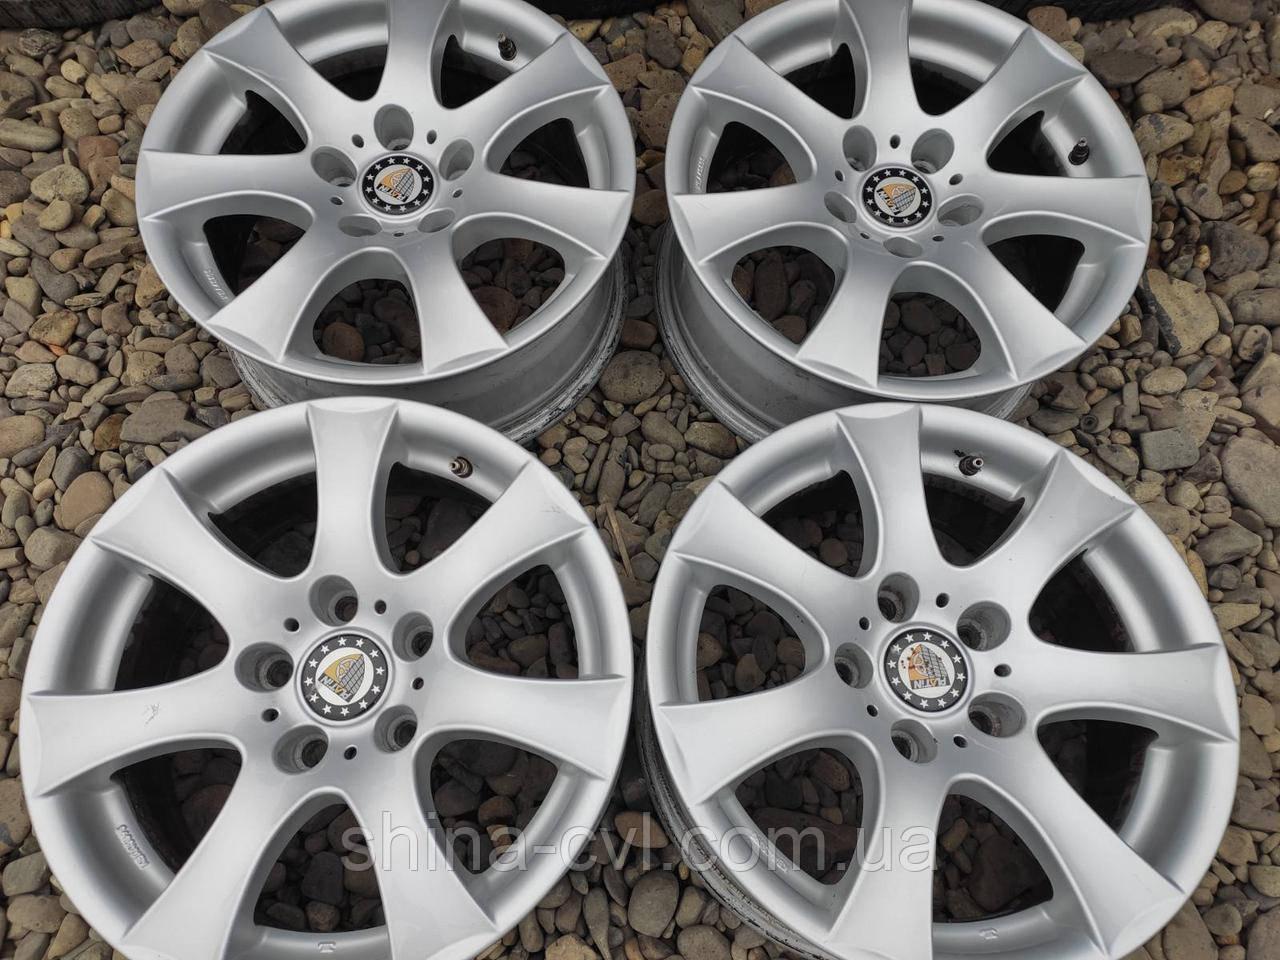 Диски 5.120 R16 7J ET20 DIA74.1 ALUTEC для BMW E39/E34; RENAULT TRAFIC; OPEL VIVARO; VOLKSWAGEN T5